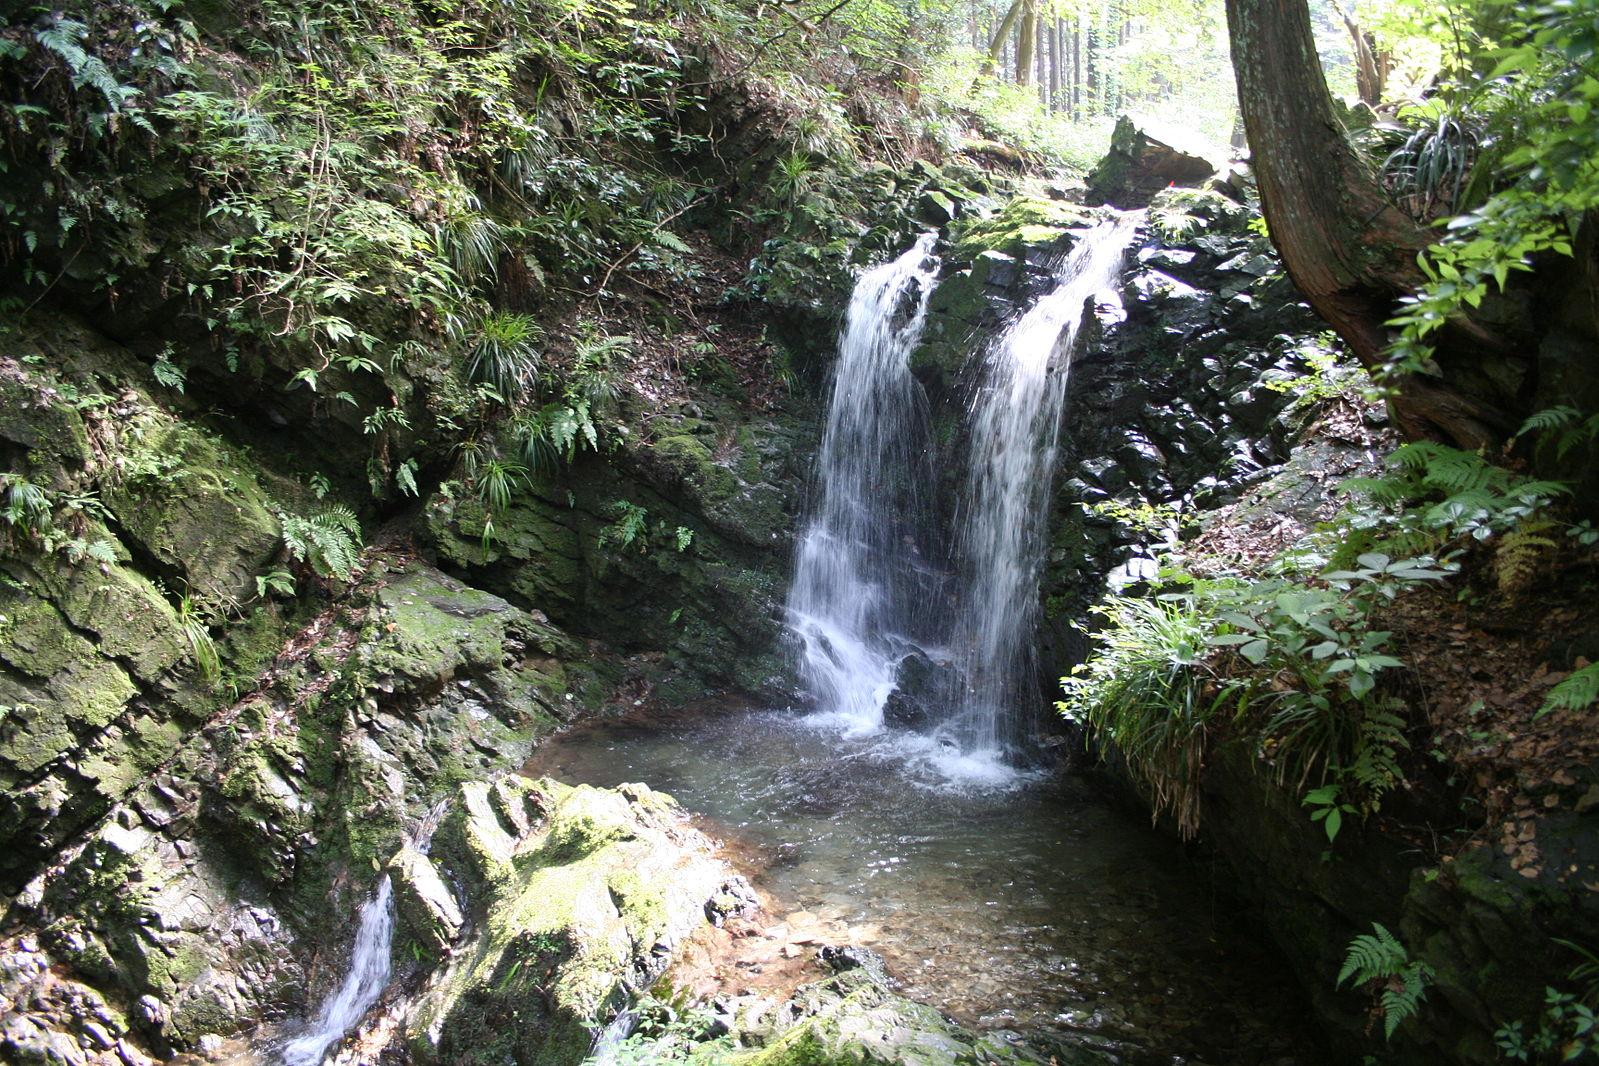 Hachioji Castle Waterfall